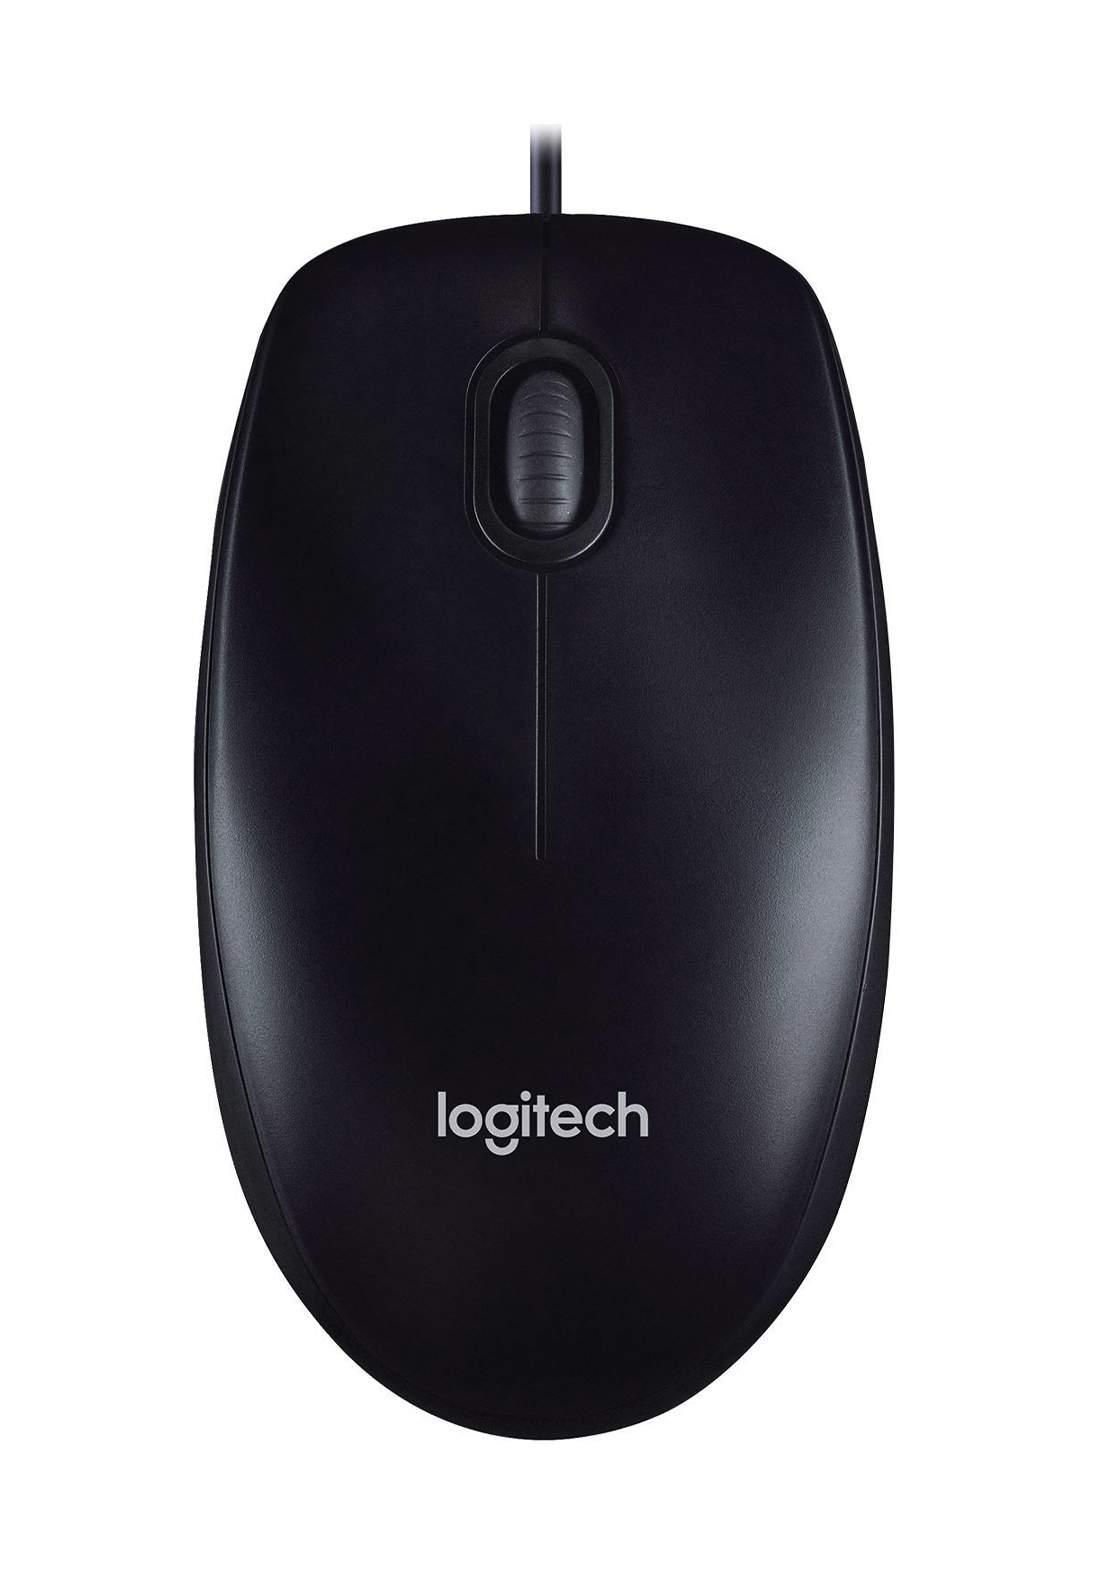 Logitech M90 Wired Mouse فأرة